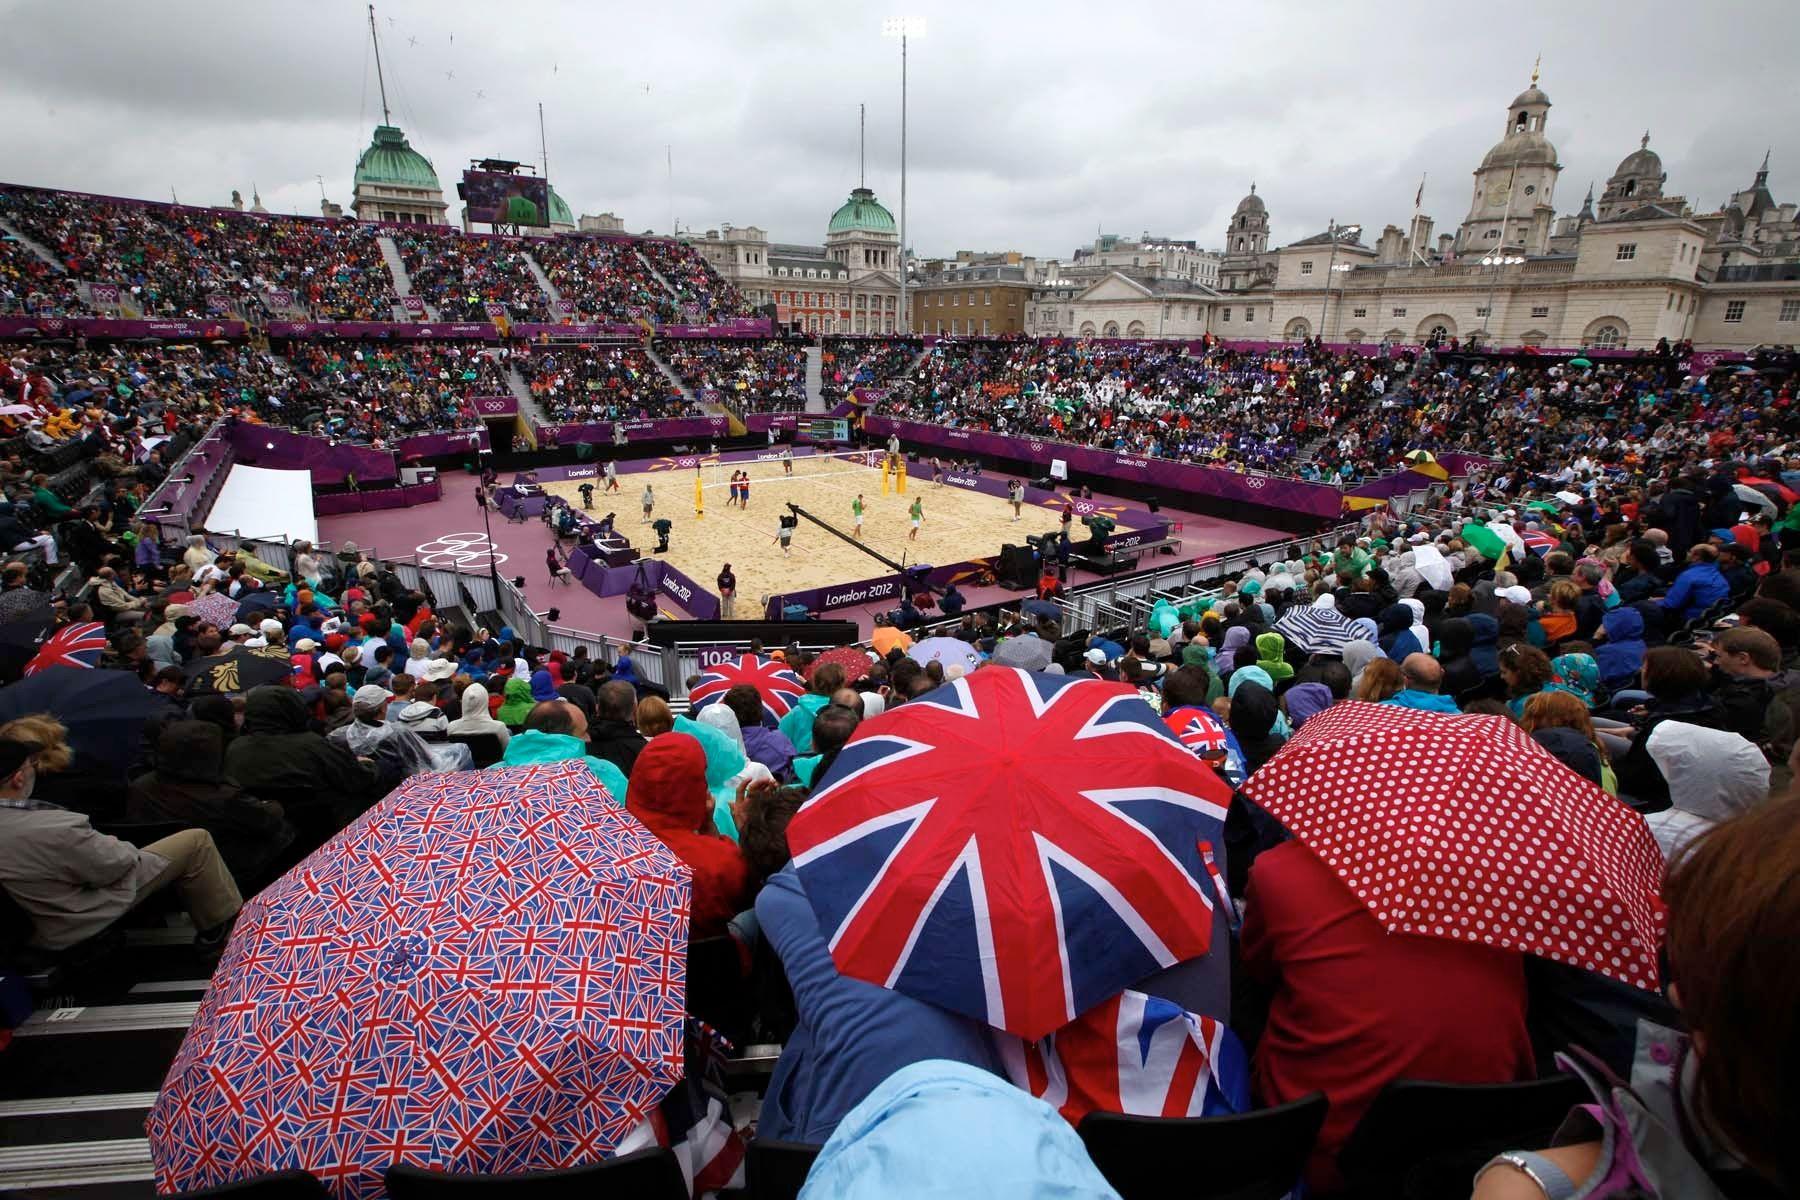 JULY 31, 2012  LONDON, ENGLAND